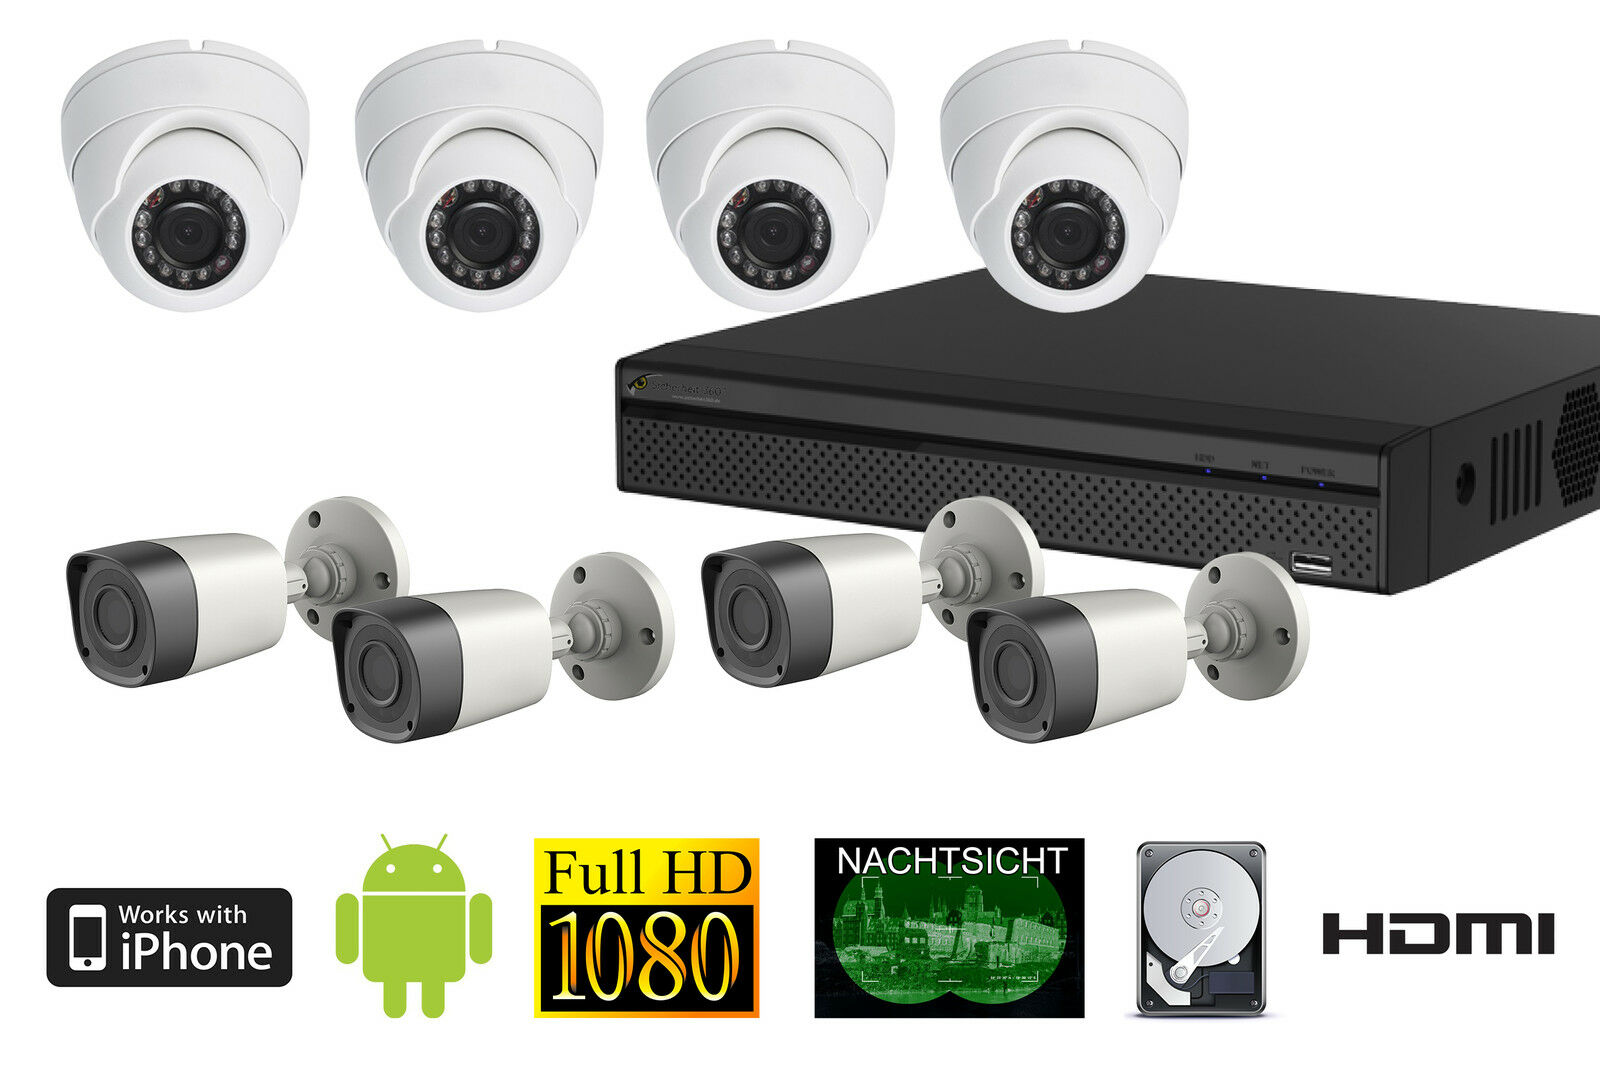 8 Kanal Full HD Set DVR 2TB 30m Nachtsicht Smartphone ÜberwachungsApp